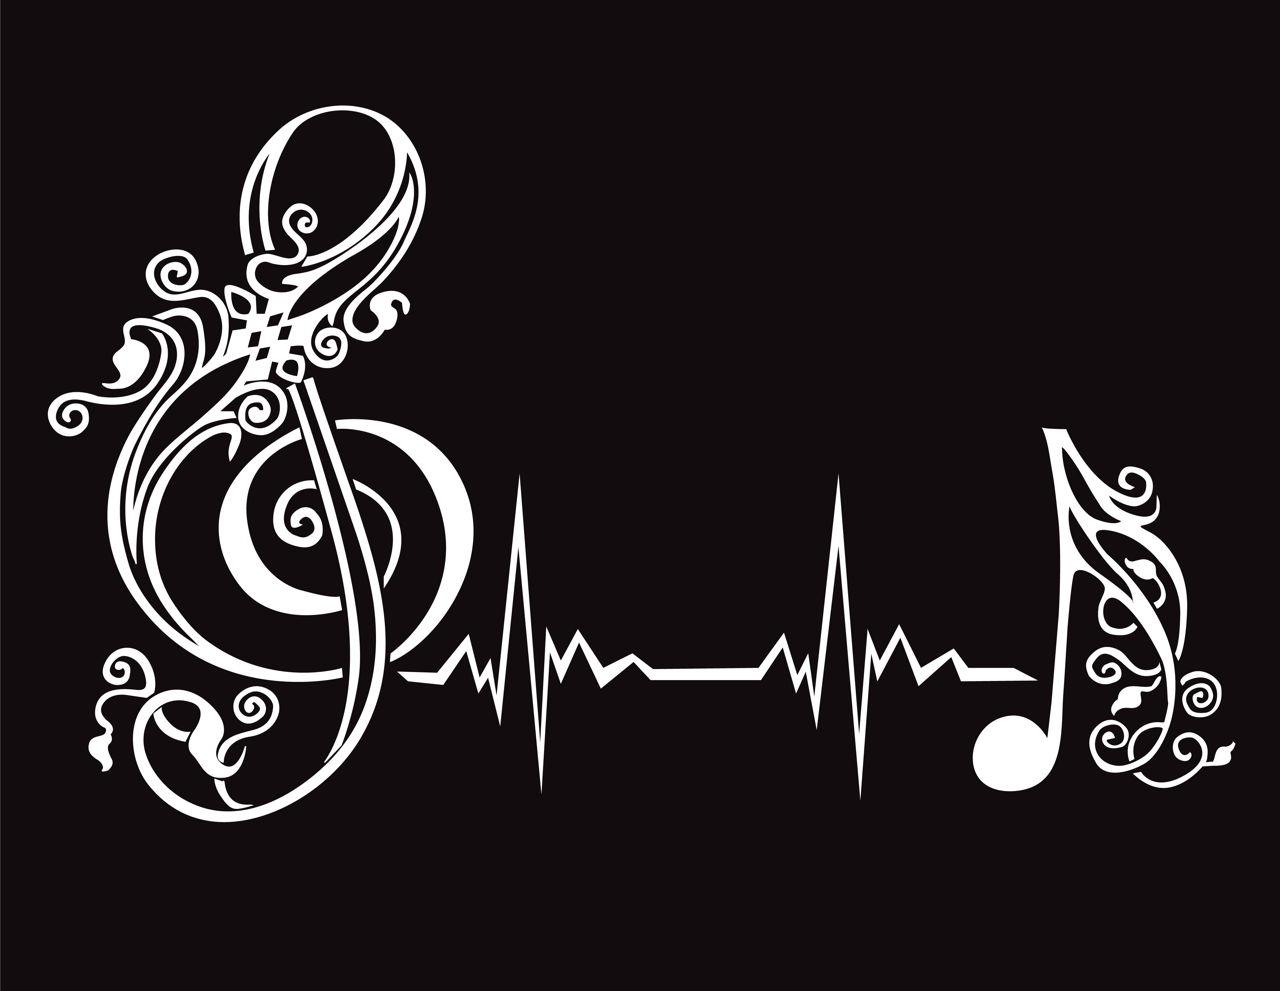 Characteristics of Minimalist Music